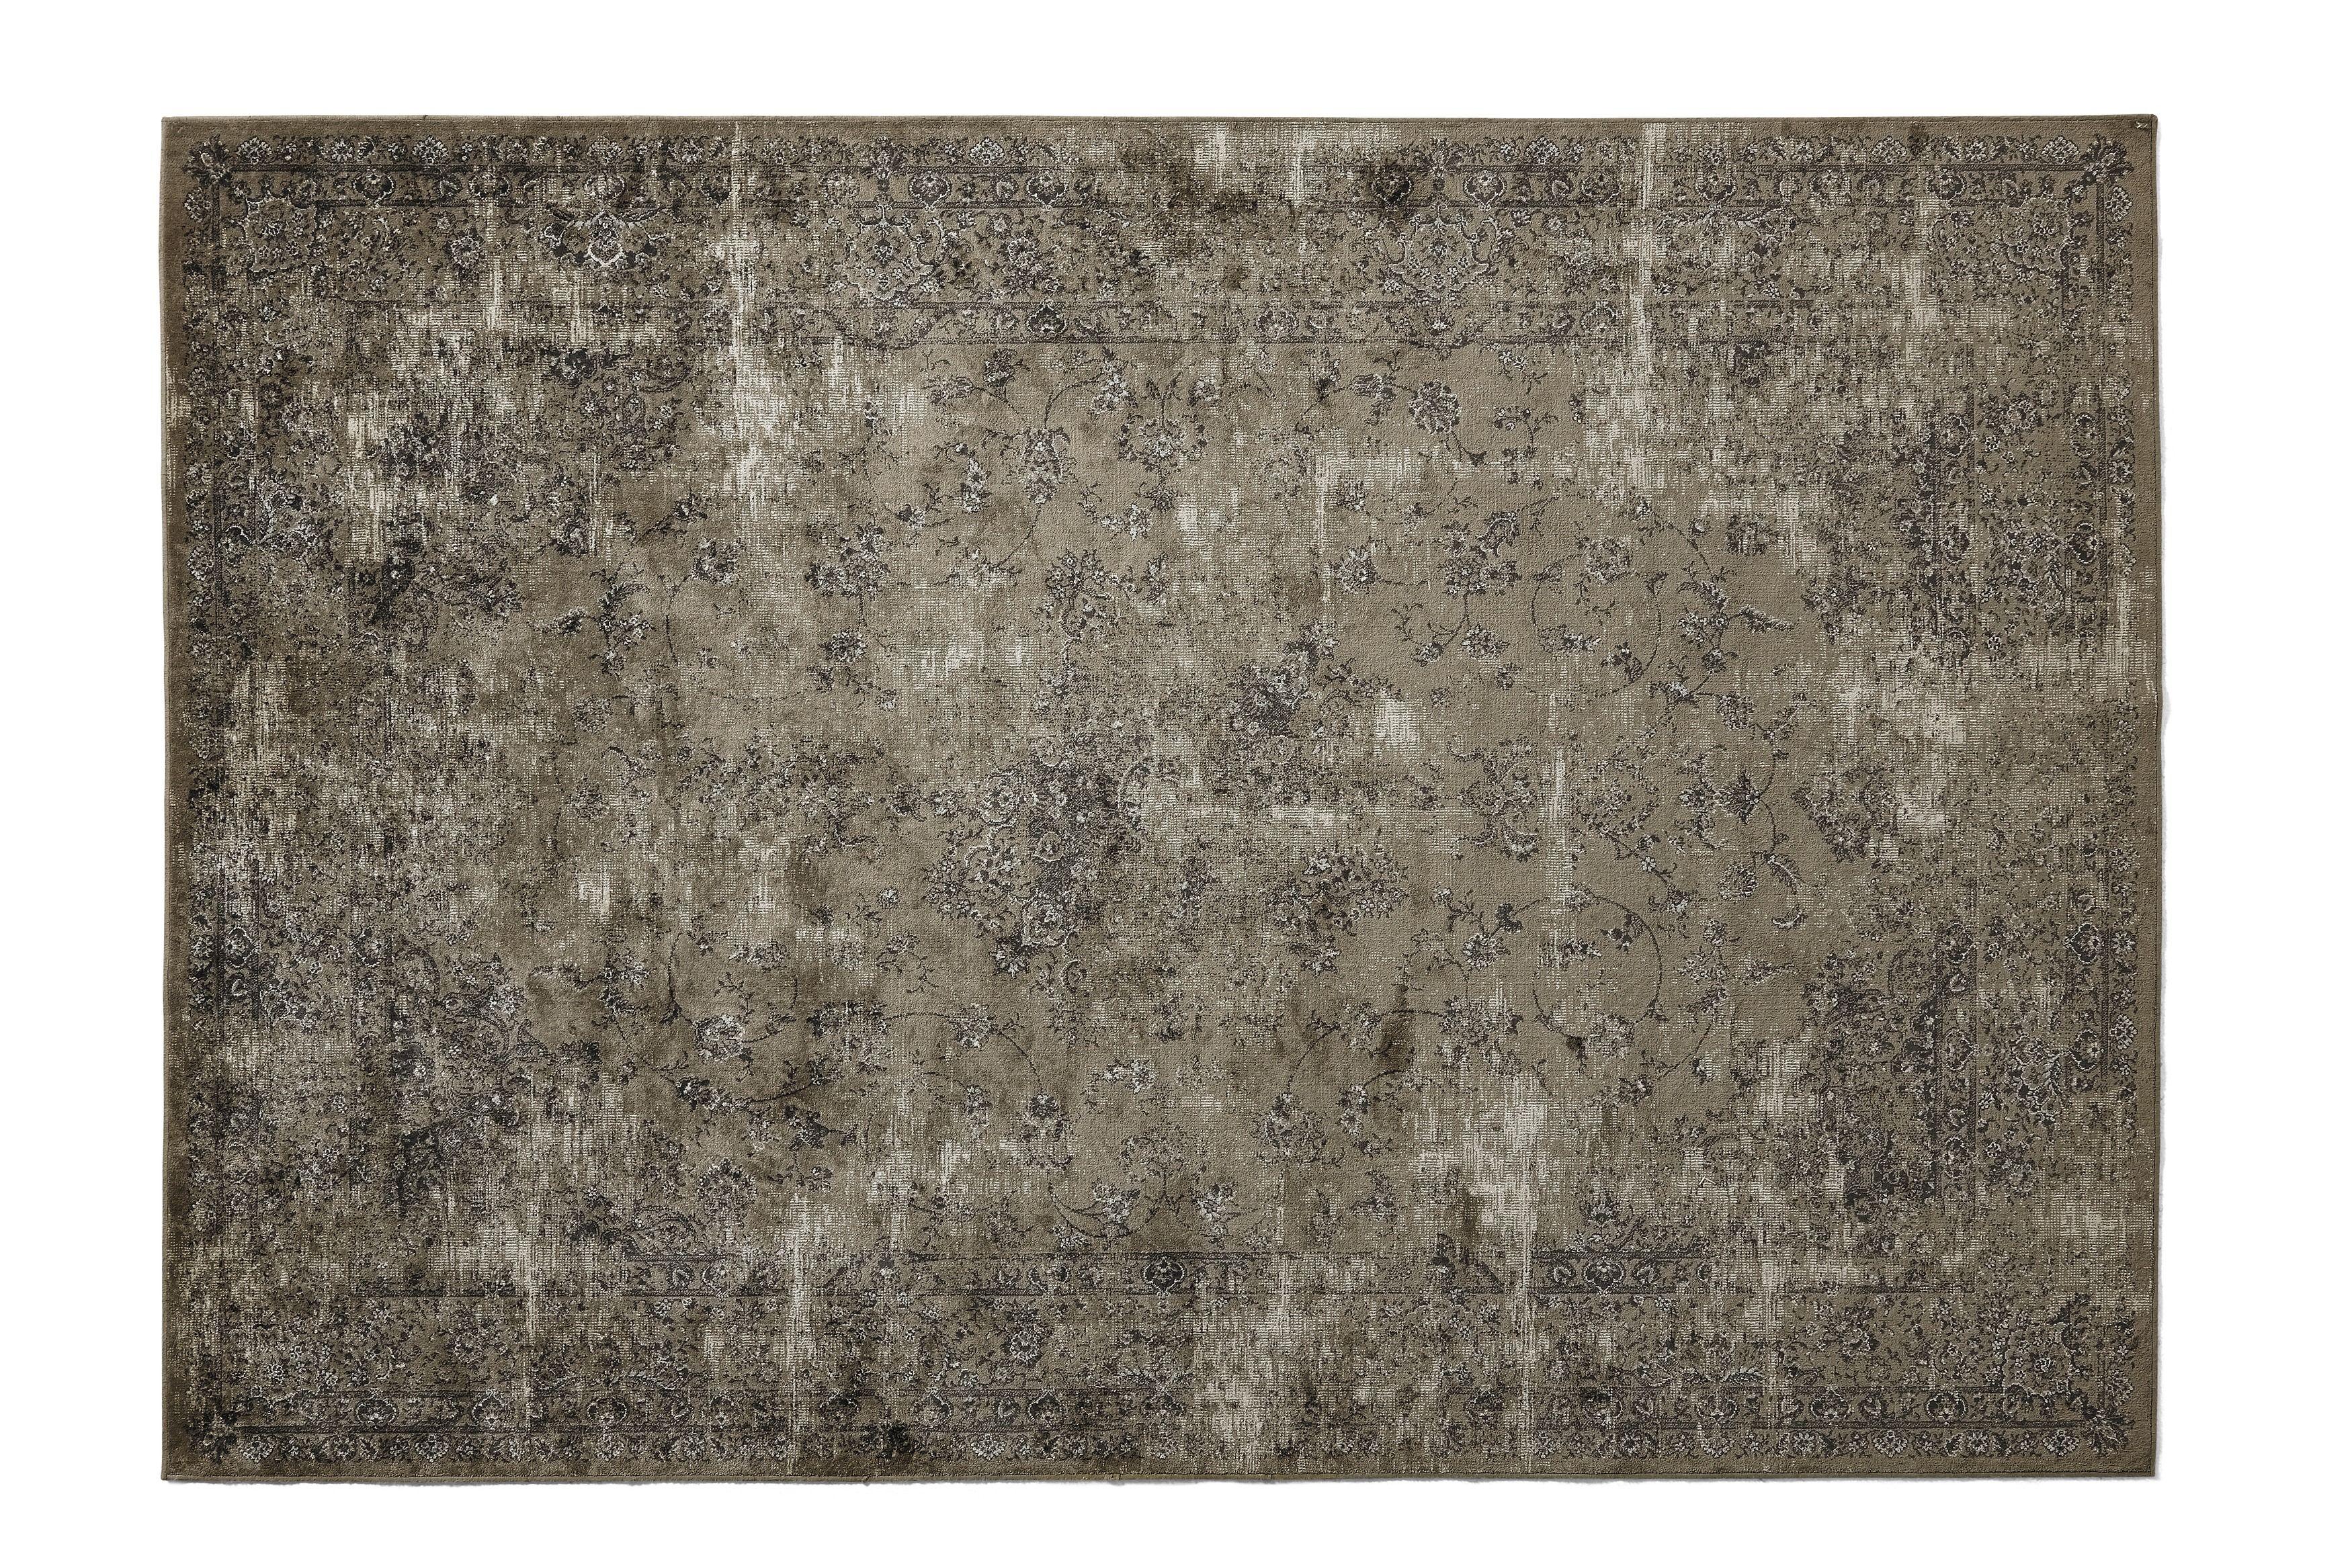 Berber Tapijt Ikea : Ikea teppich adum rugs ikea ireland dublin